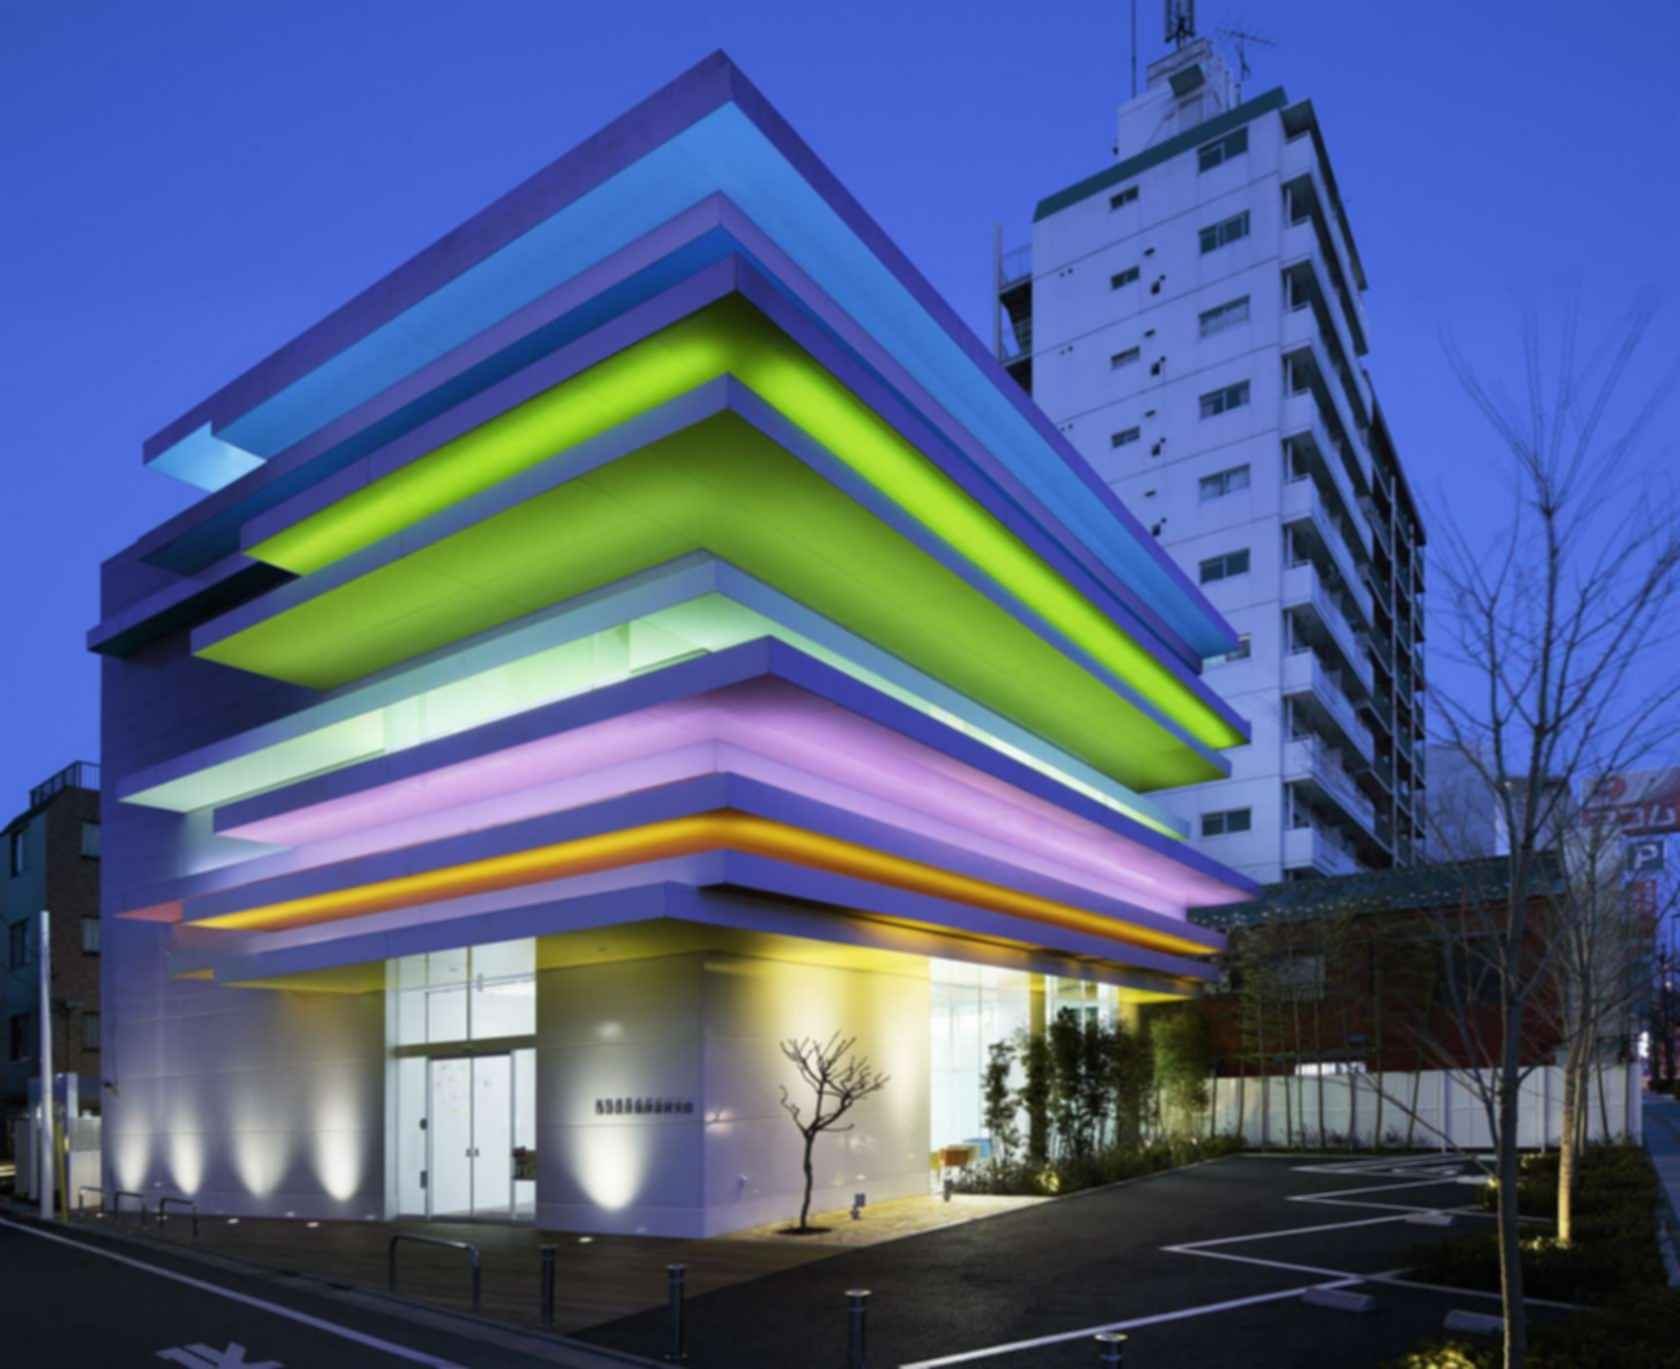 Sugamo Shinkin Bank - Exterior at Night